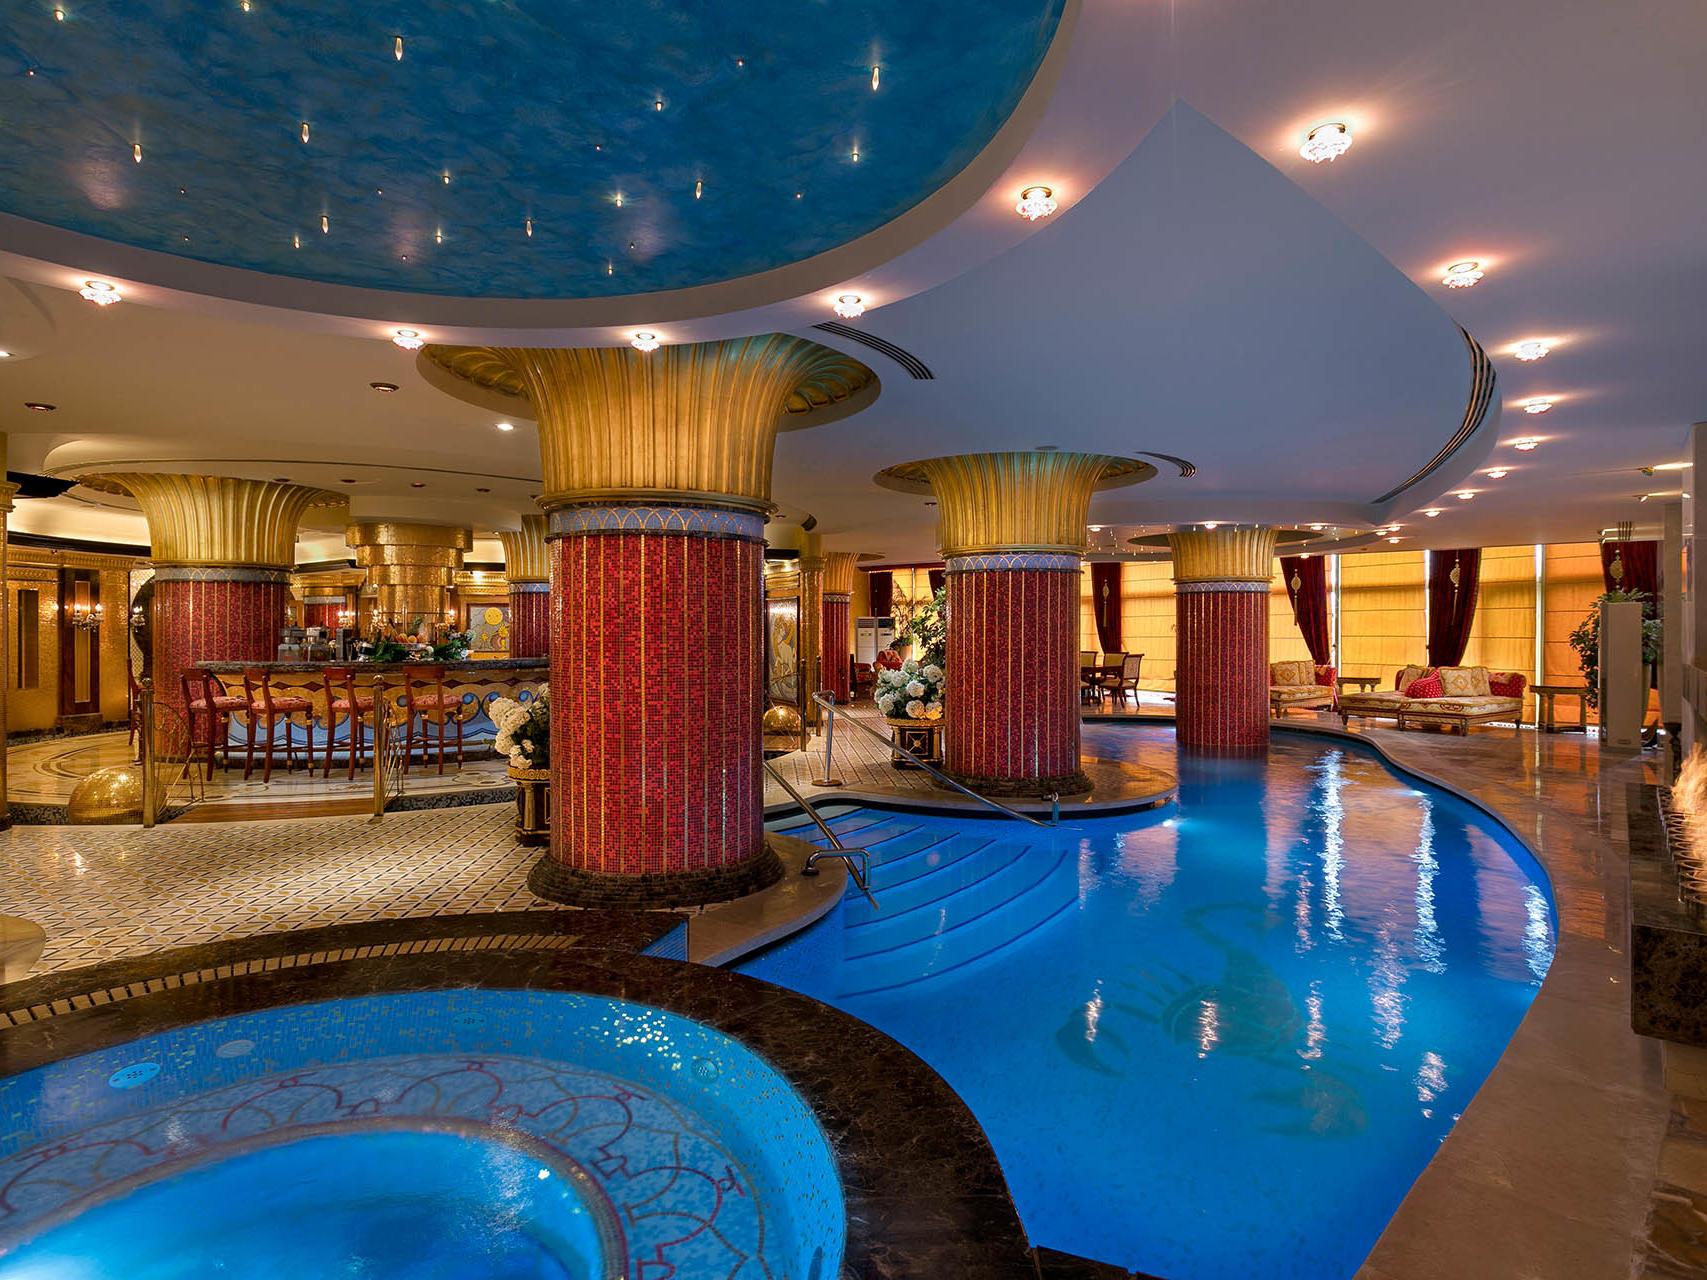 Mardanpalacehotel-Otel-Mermer-Dekorasyon- (3)